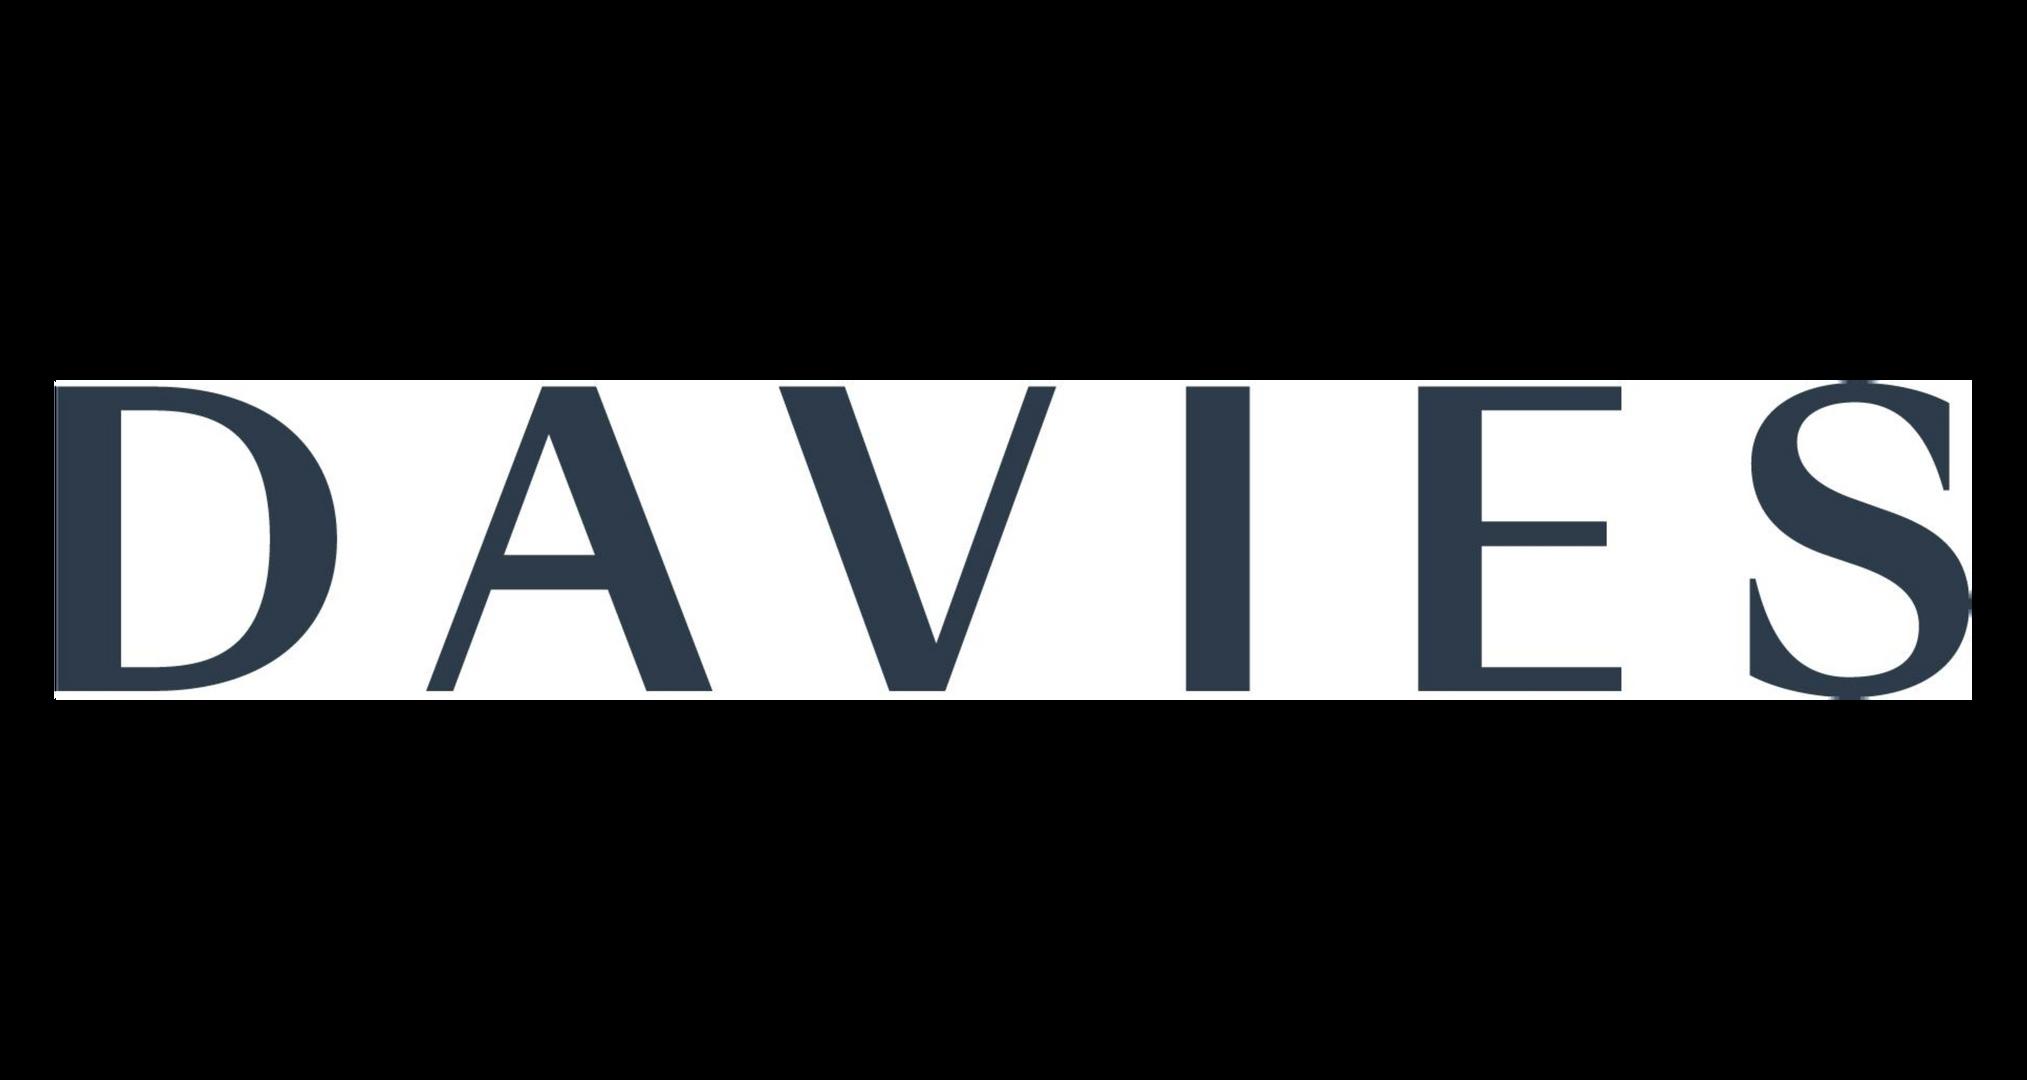 DAVIES.png